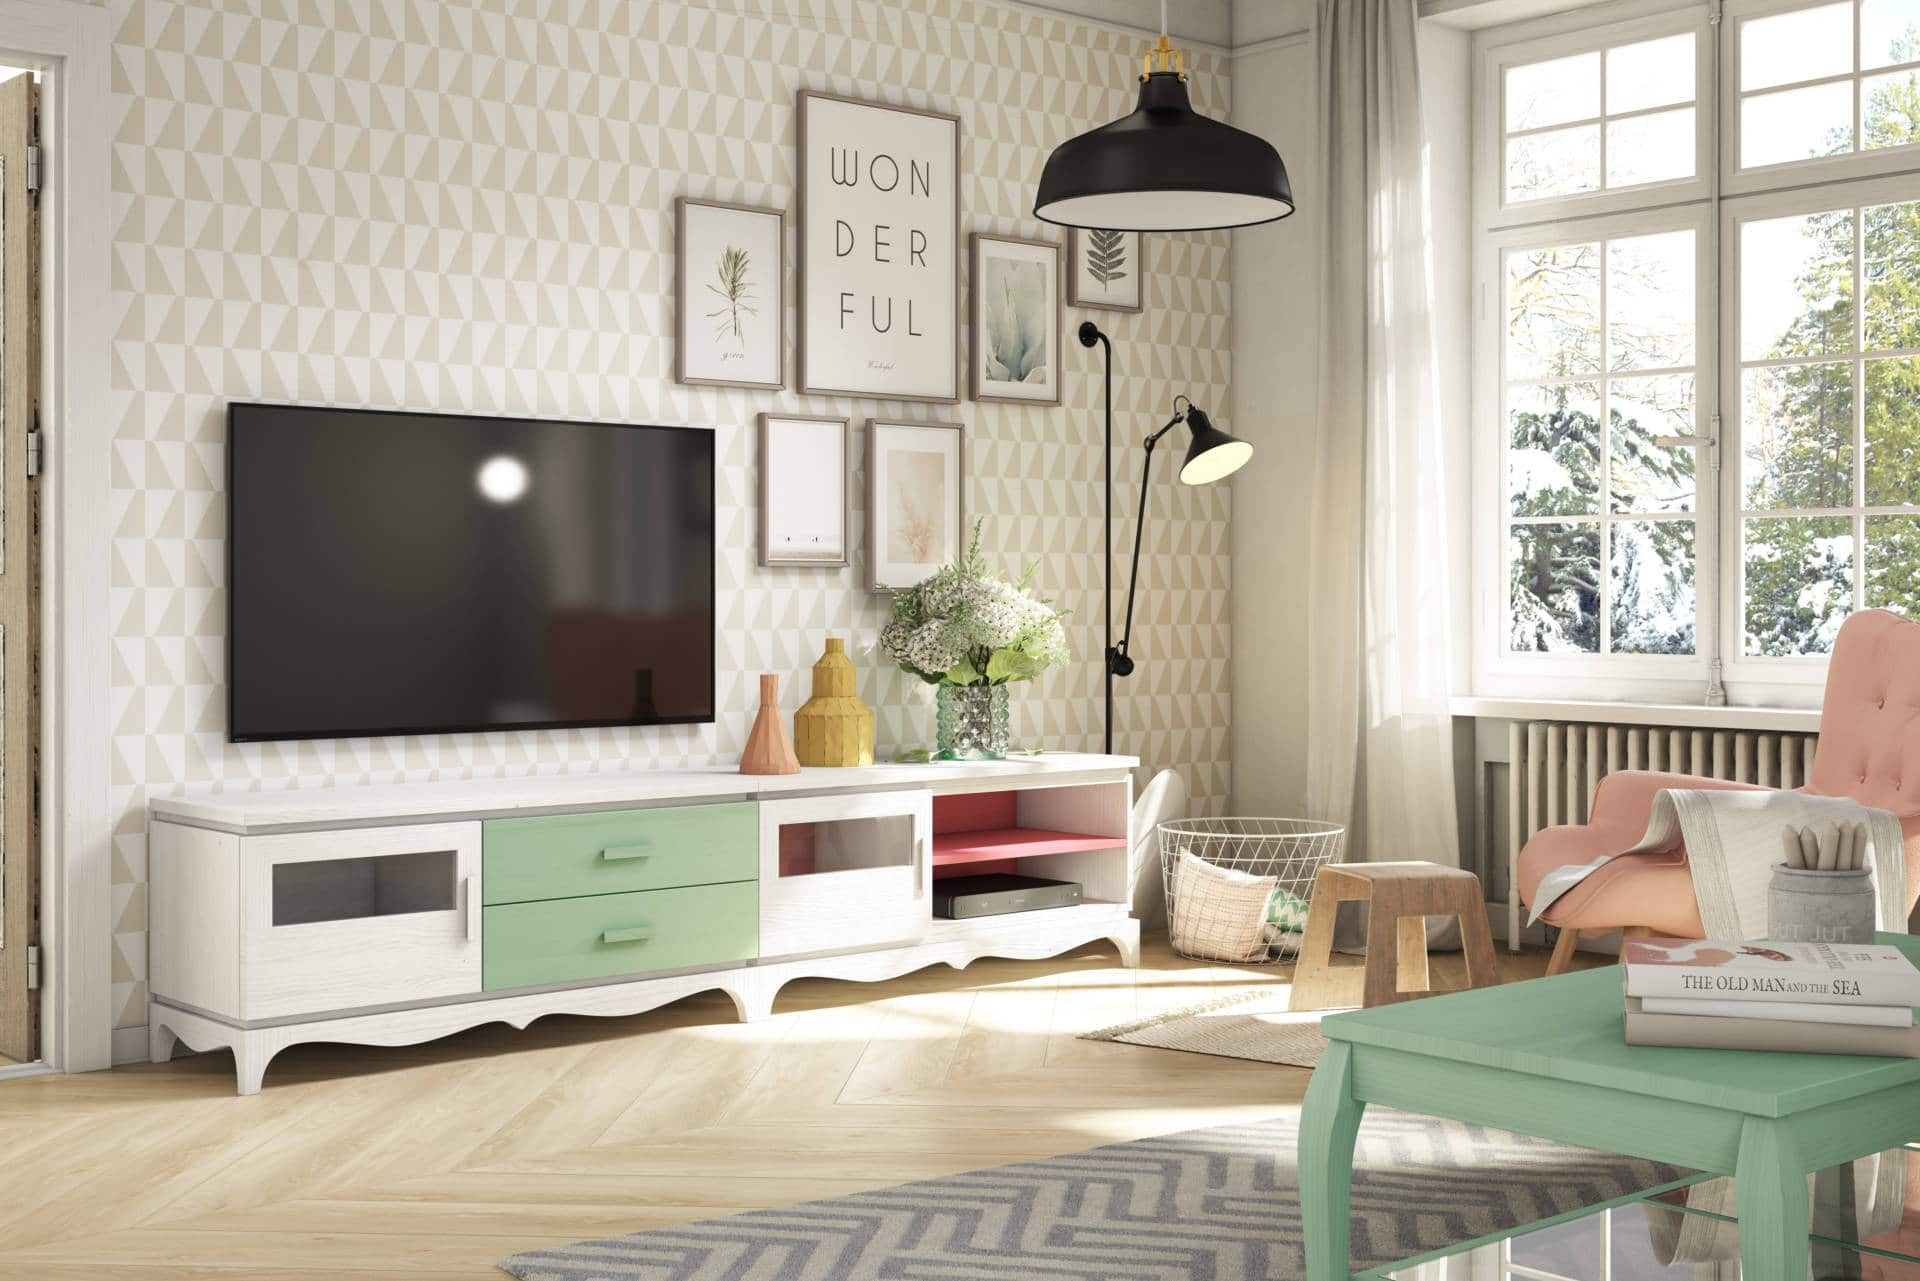 Muebles Salon Rusticos Muebles De Saln Color Claro With Muebles  # Muebles Merkamueble Dodro